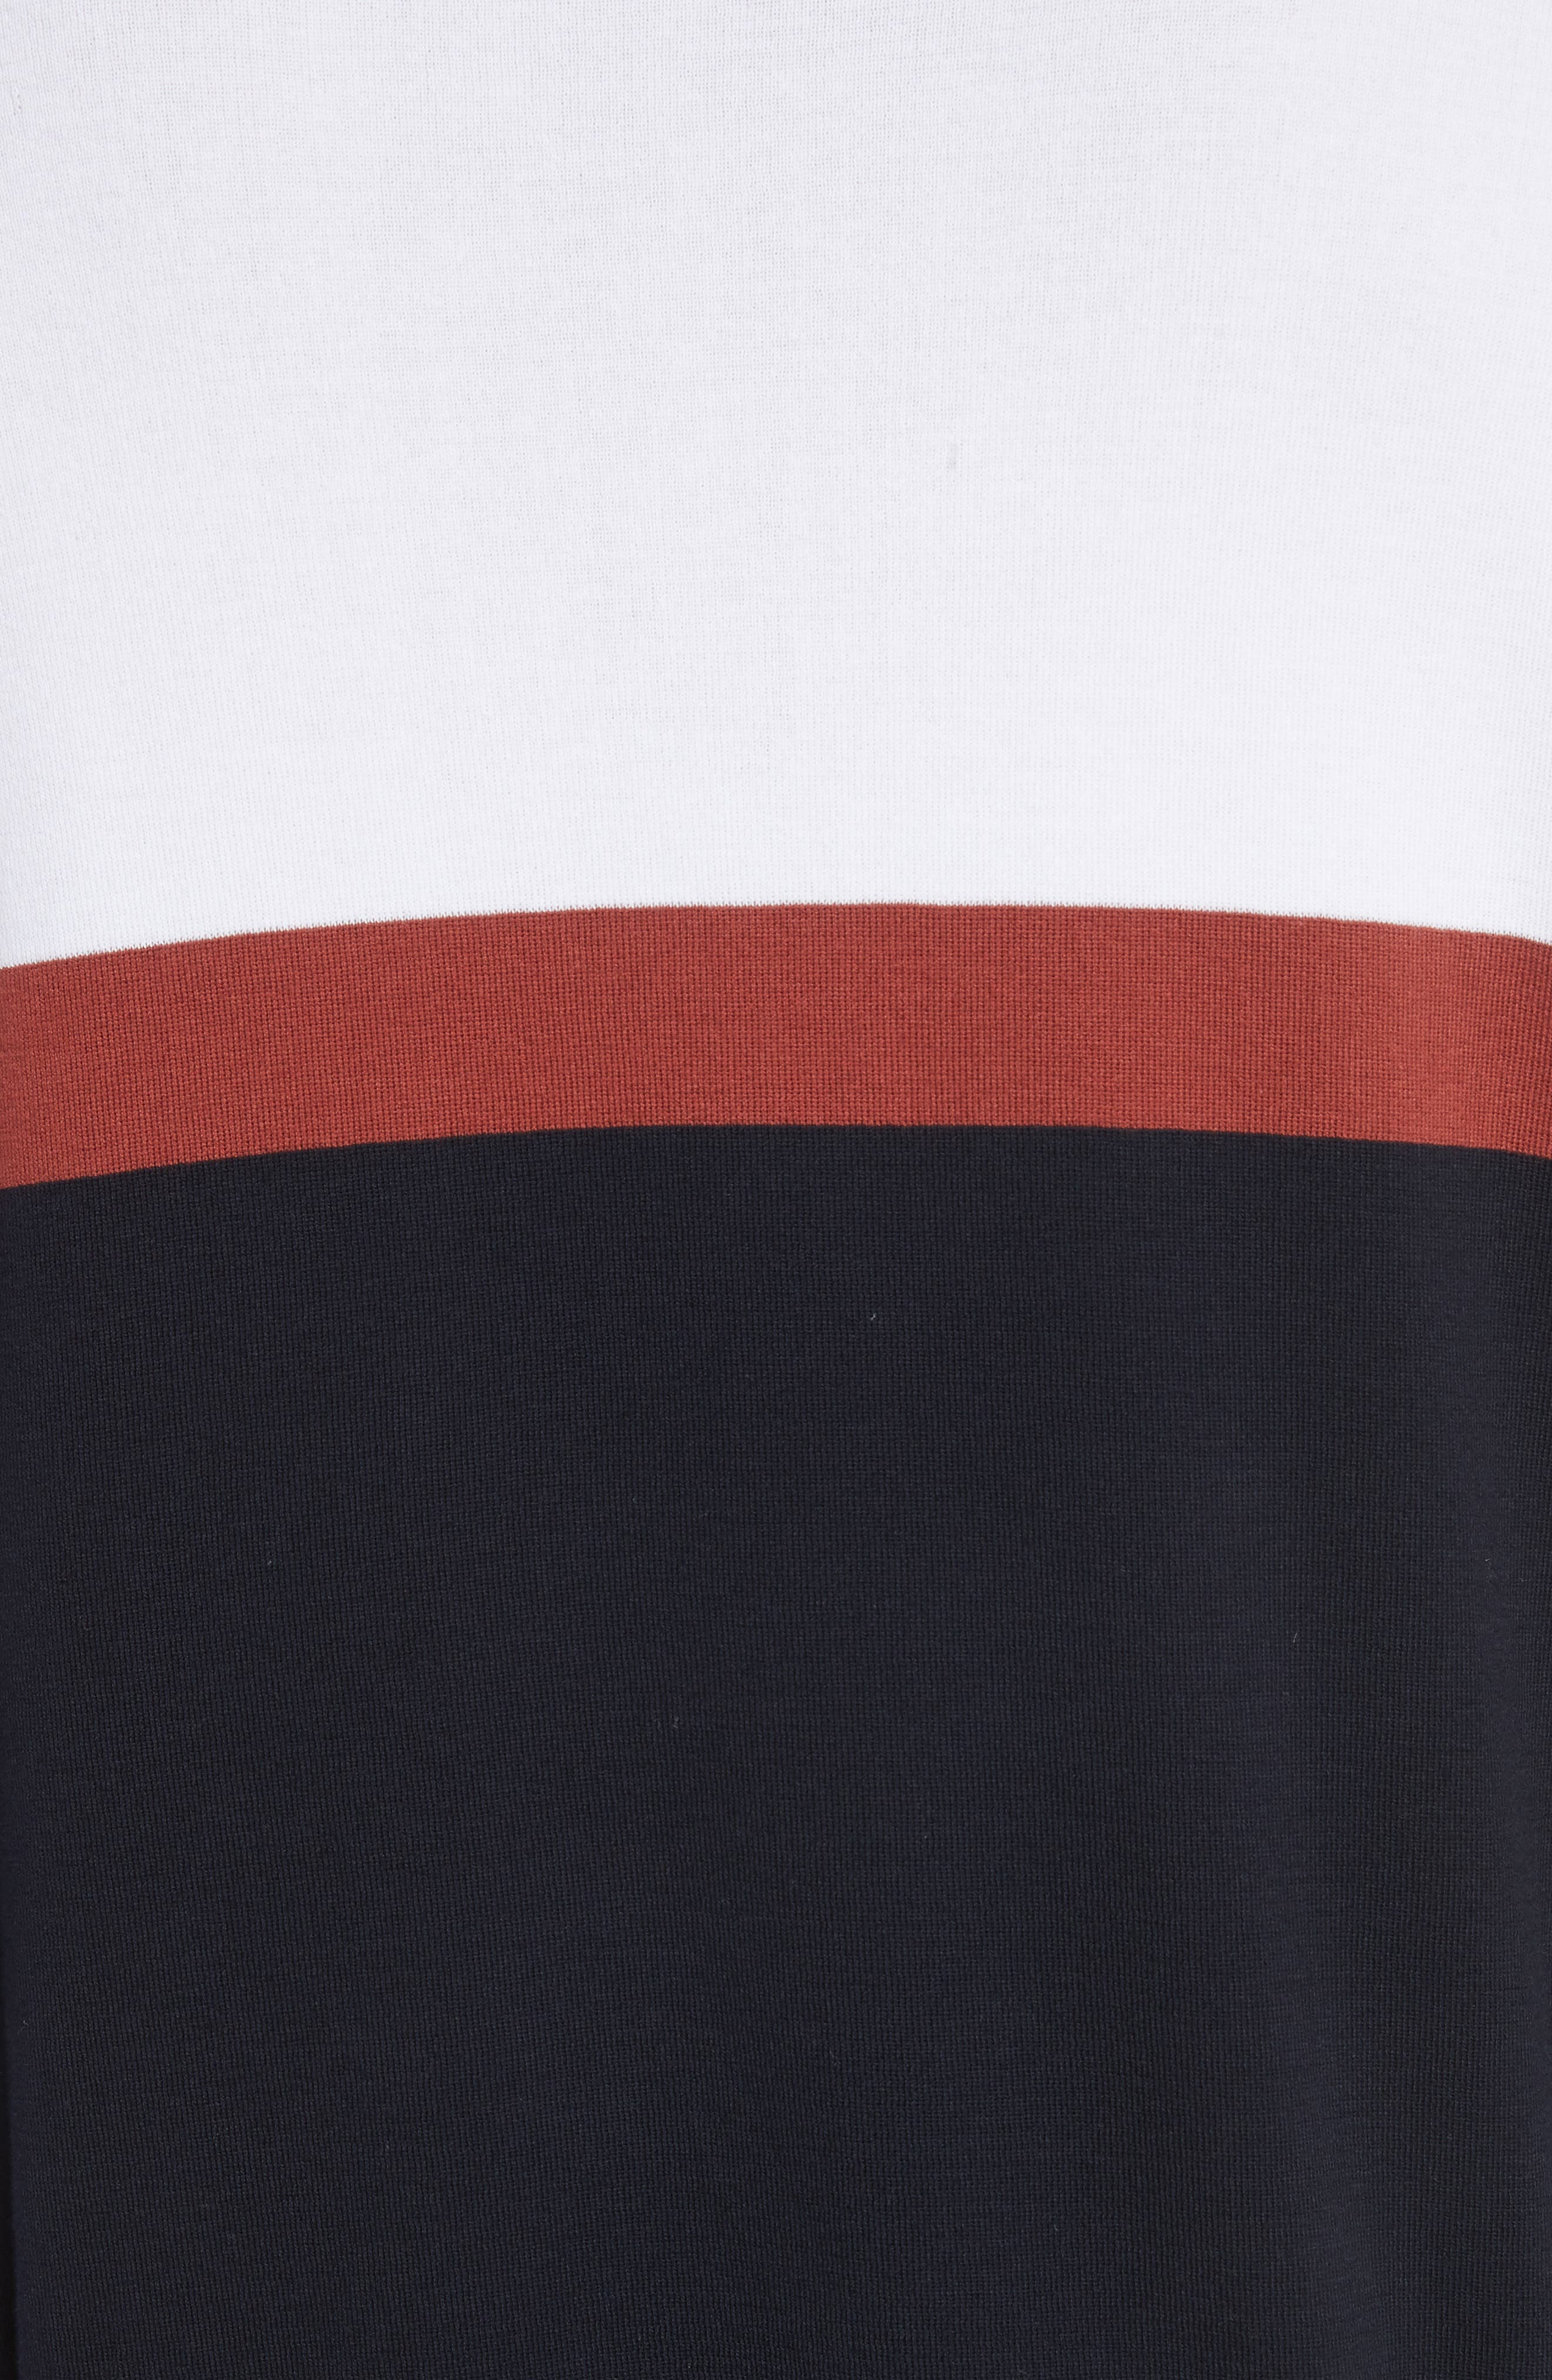 Colorblock Crewneck Sweater,                             Alternate thumbnail 5, color,                             100